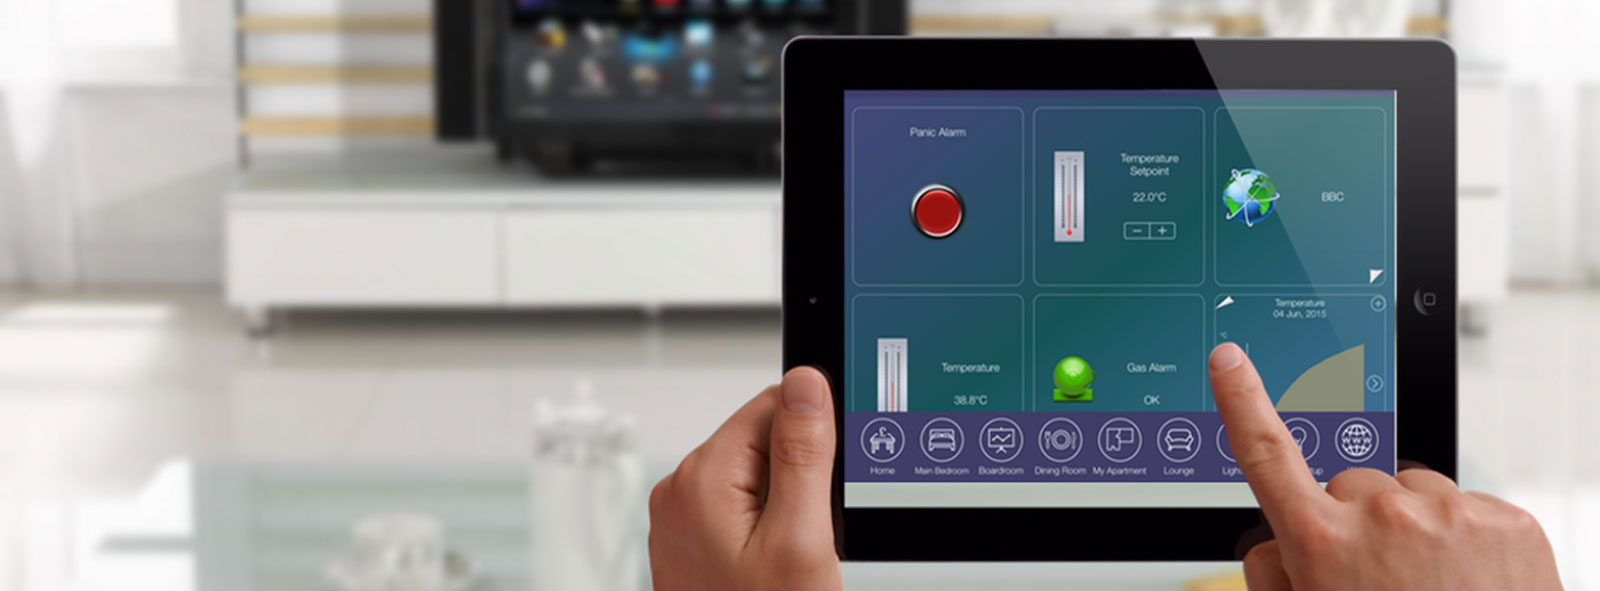 Tyrrell Smart Home App